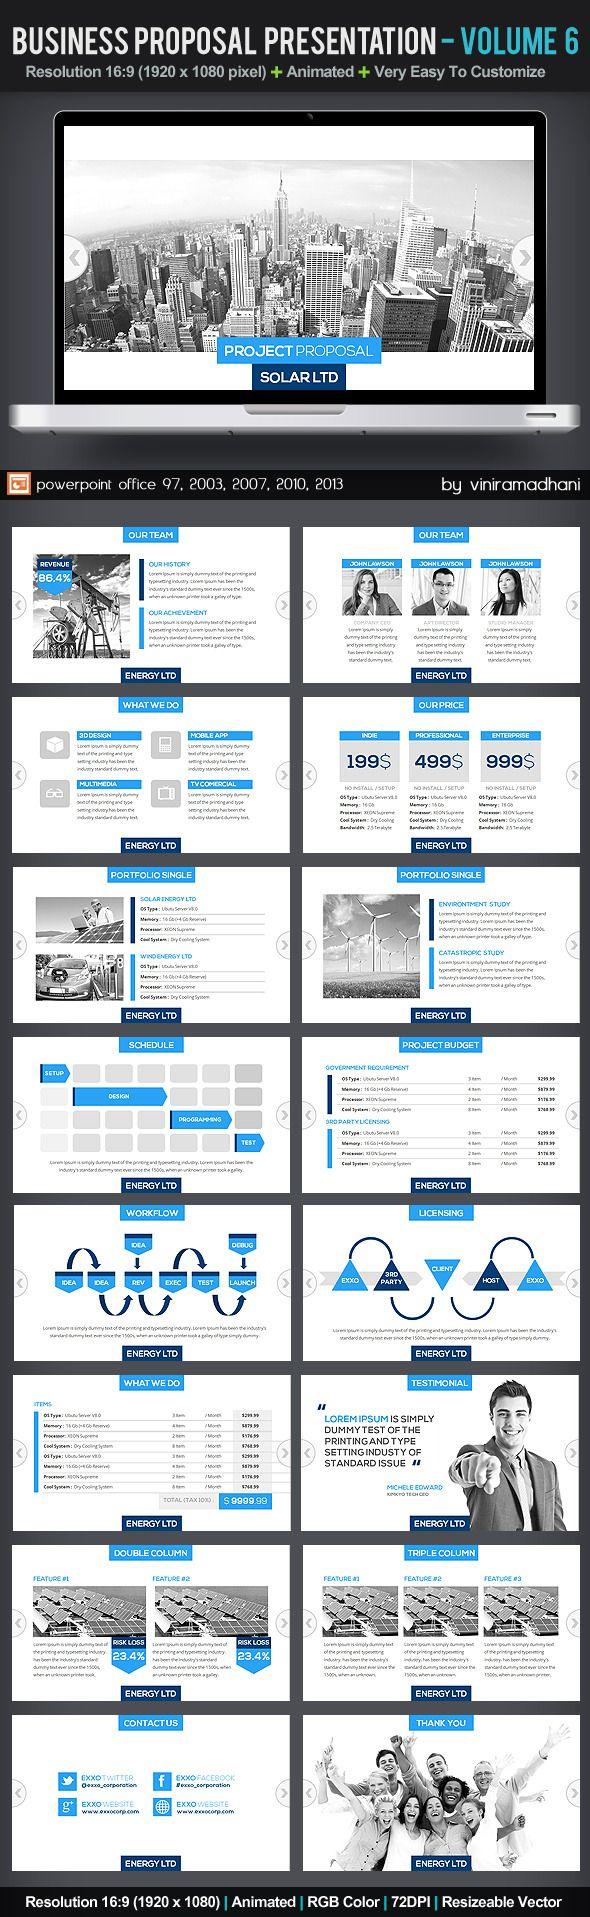 1763 best powerpoint template images on pinterest font logo business proposal presentation volume 6 powerpoint presentationsbusiness powerpoint templatesbusiness toneelgroepblik Image collections